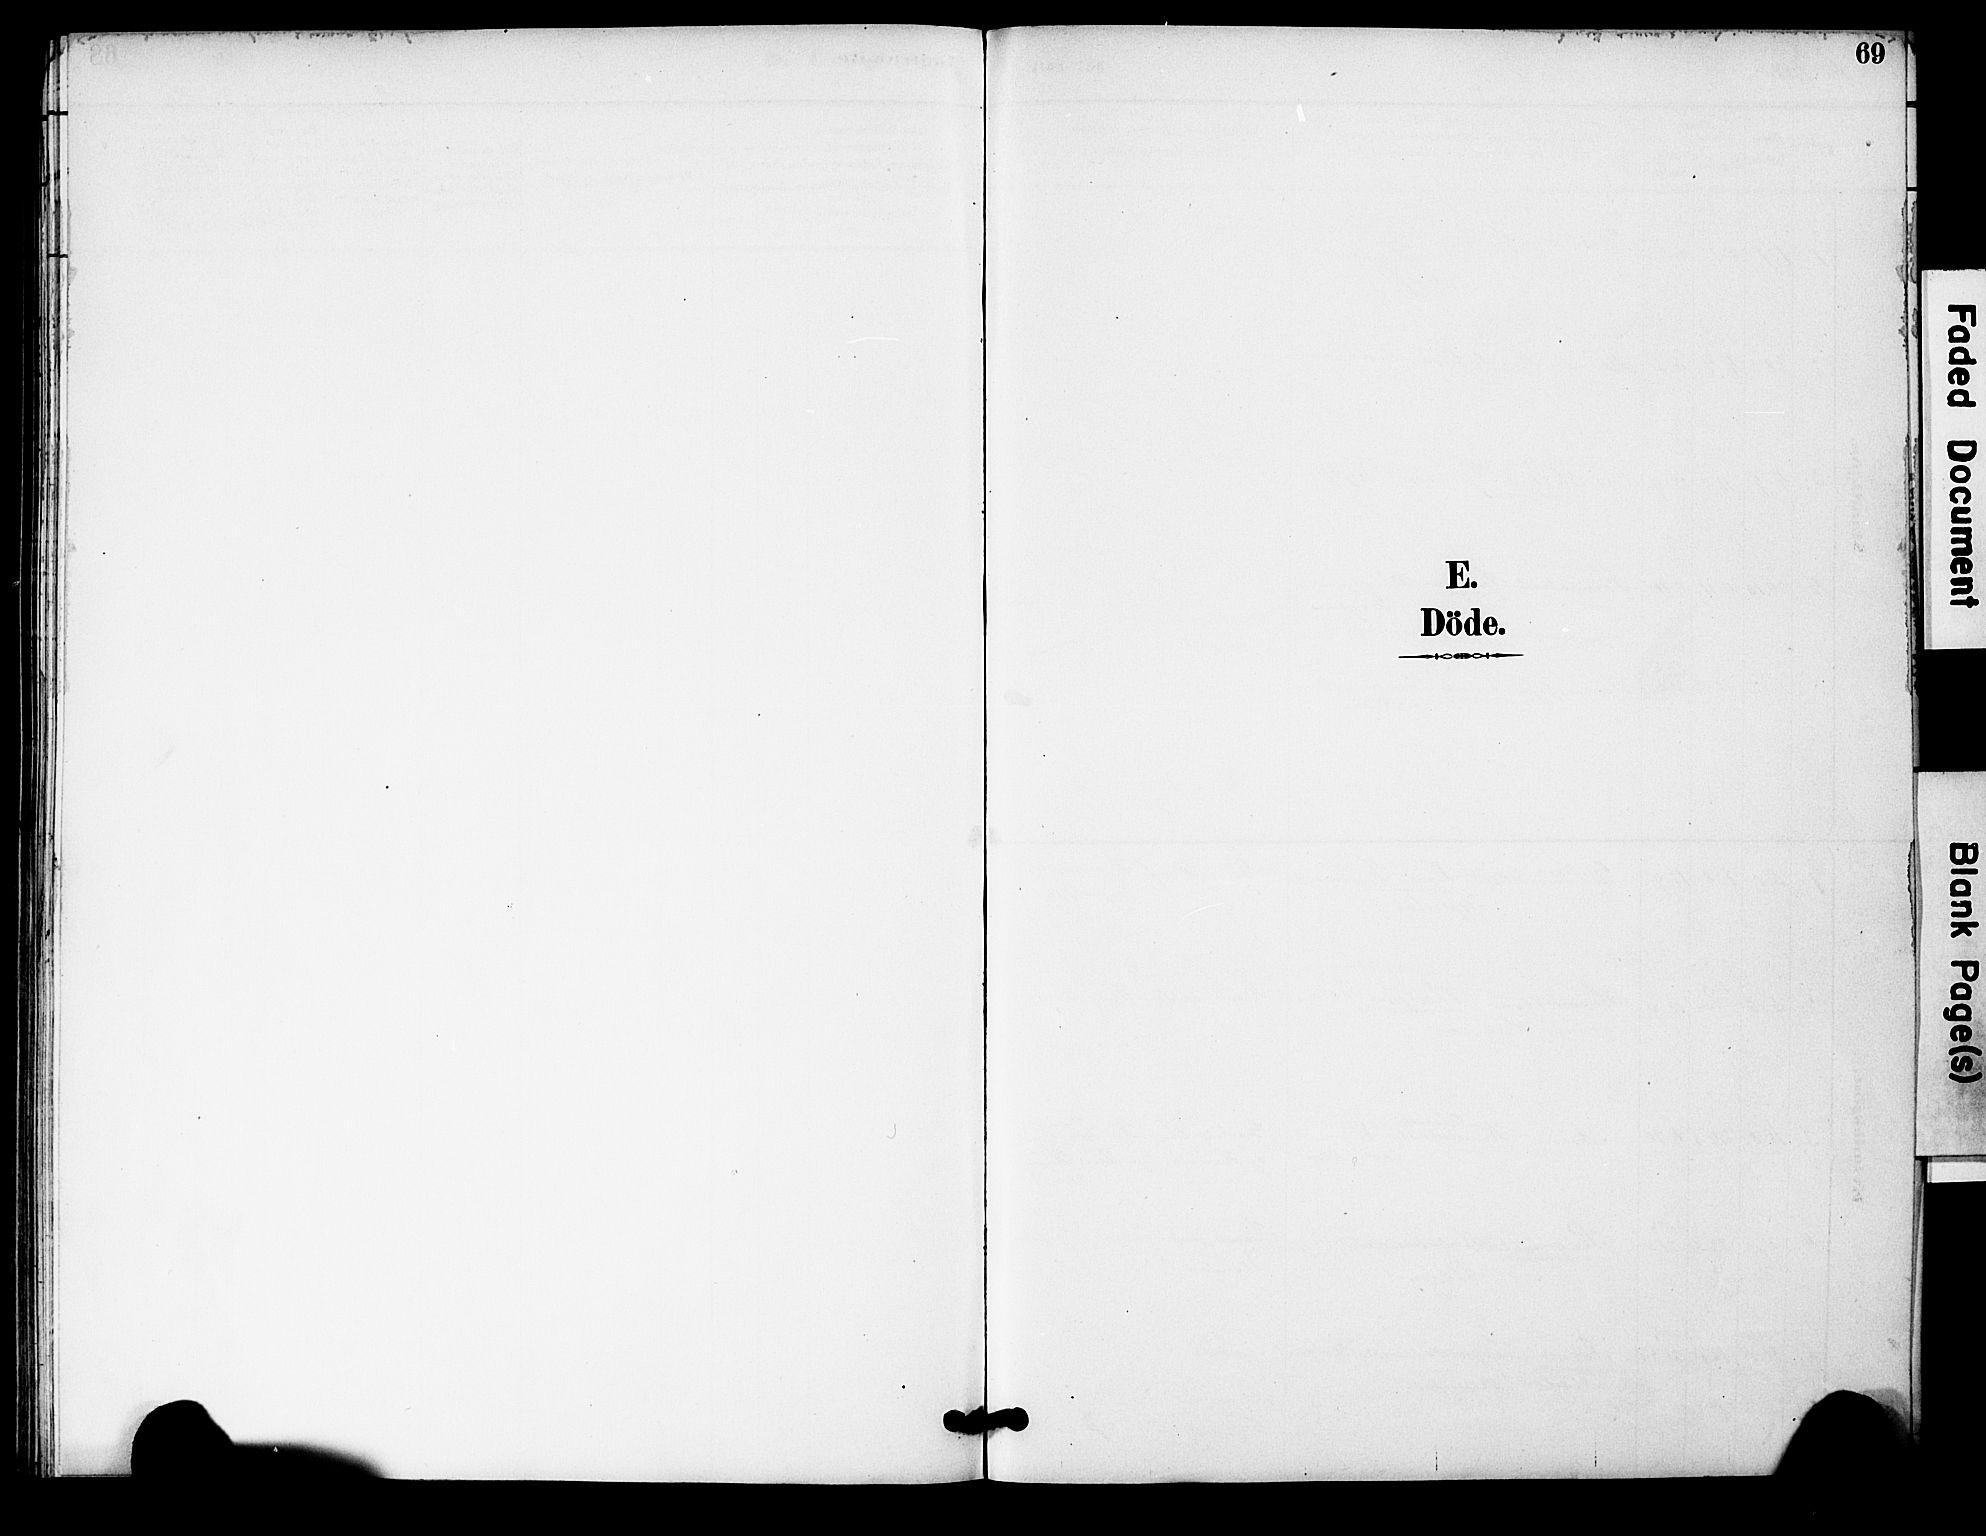 SAK, Bygland sokneprestkontor, F/Fa/Fac/L0001: Ministerialbok nr. A 1, 1885-1909, s. 69